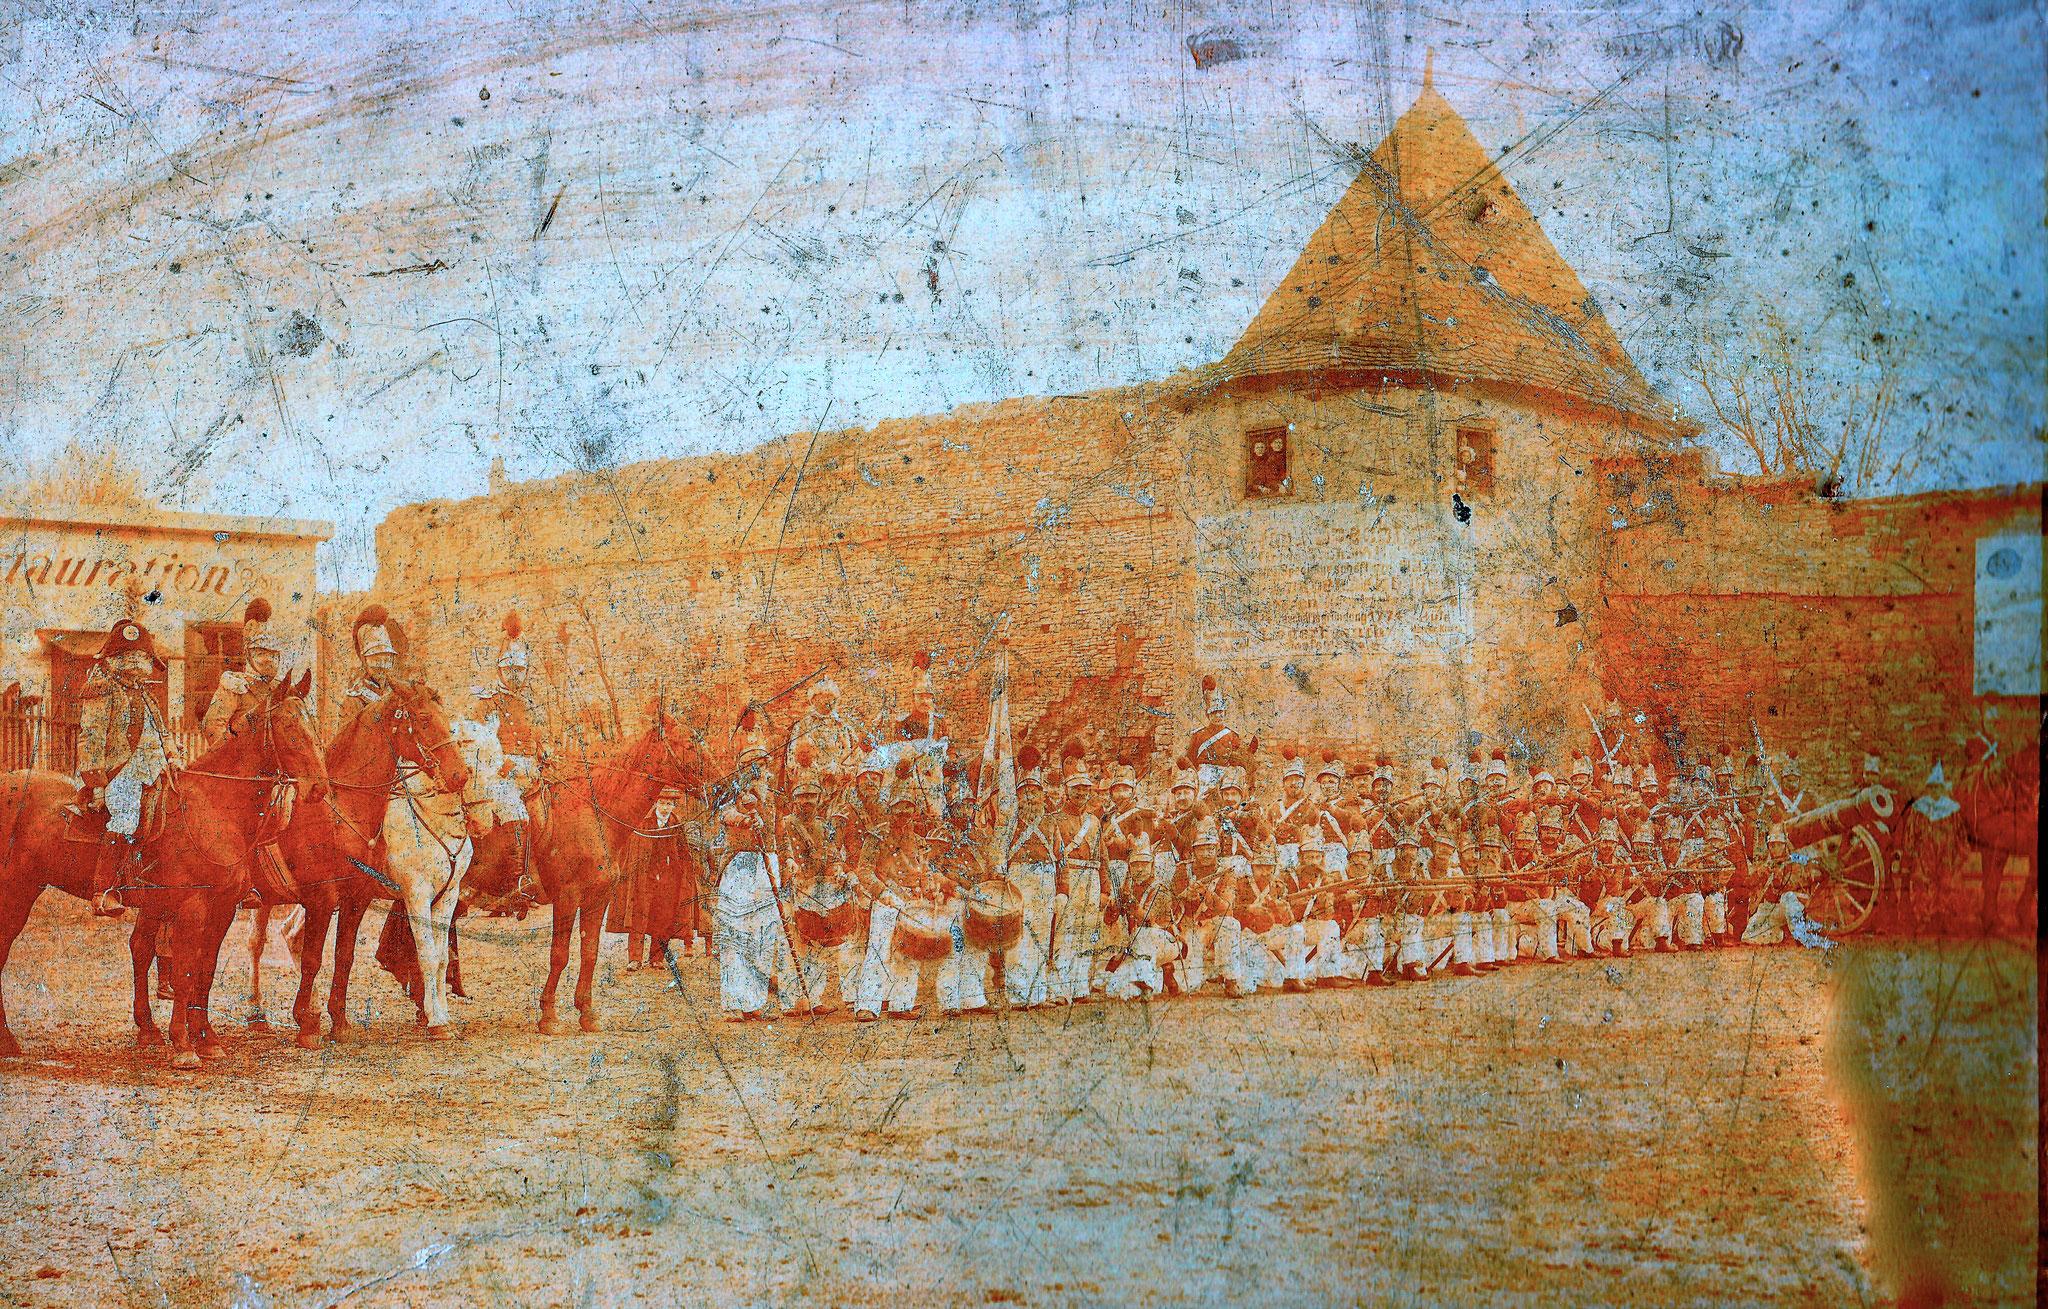 Maskerade Anfang des 20. Jahrhunderts am Höpperlesturm